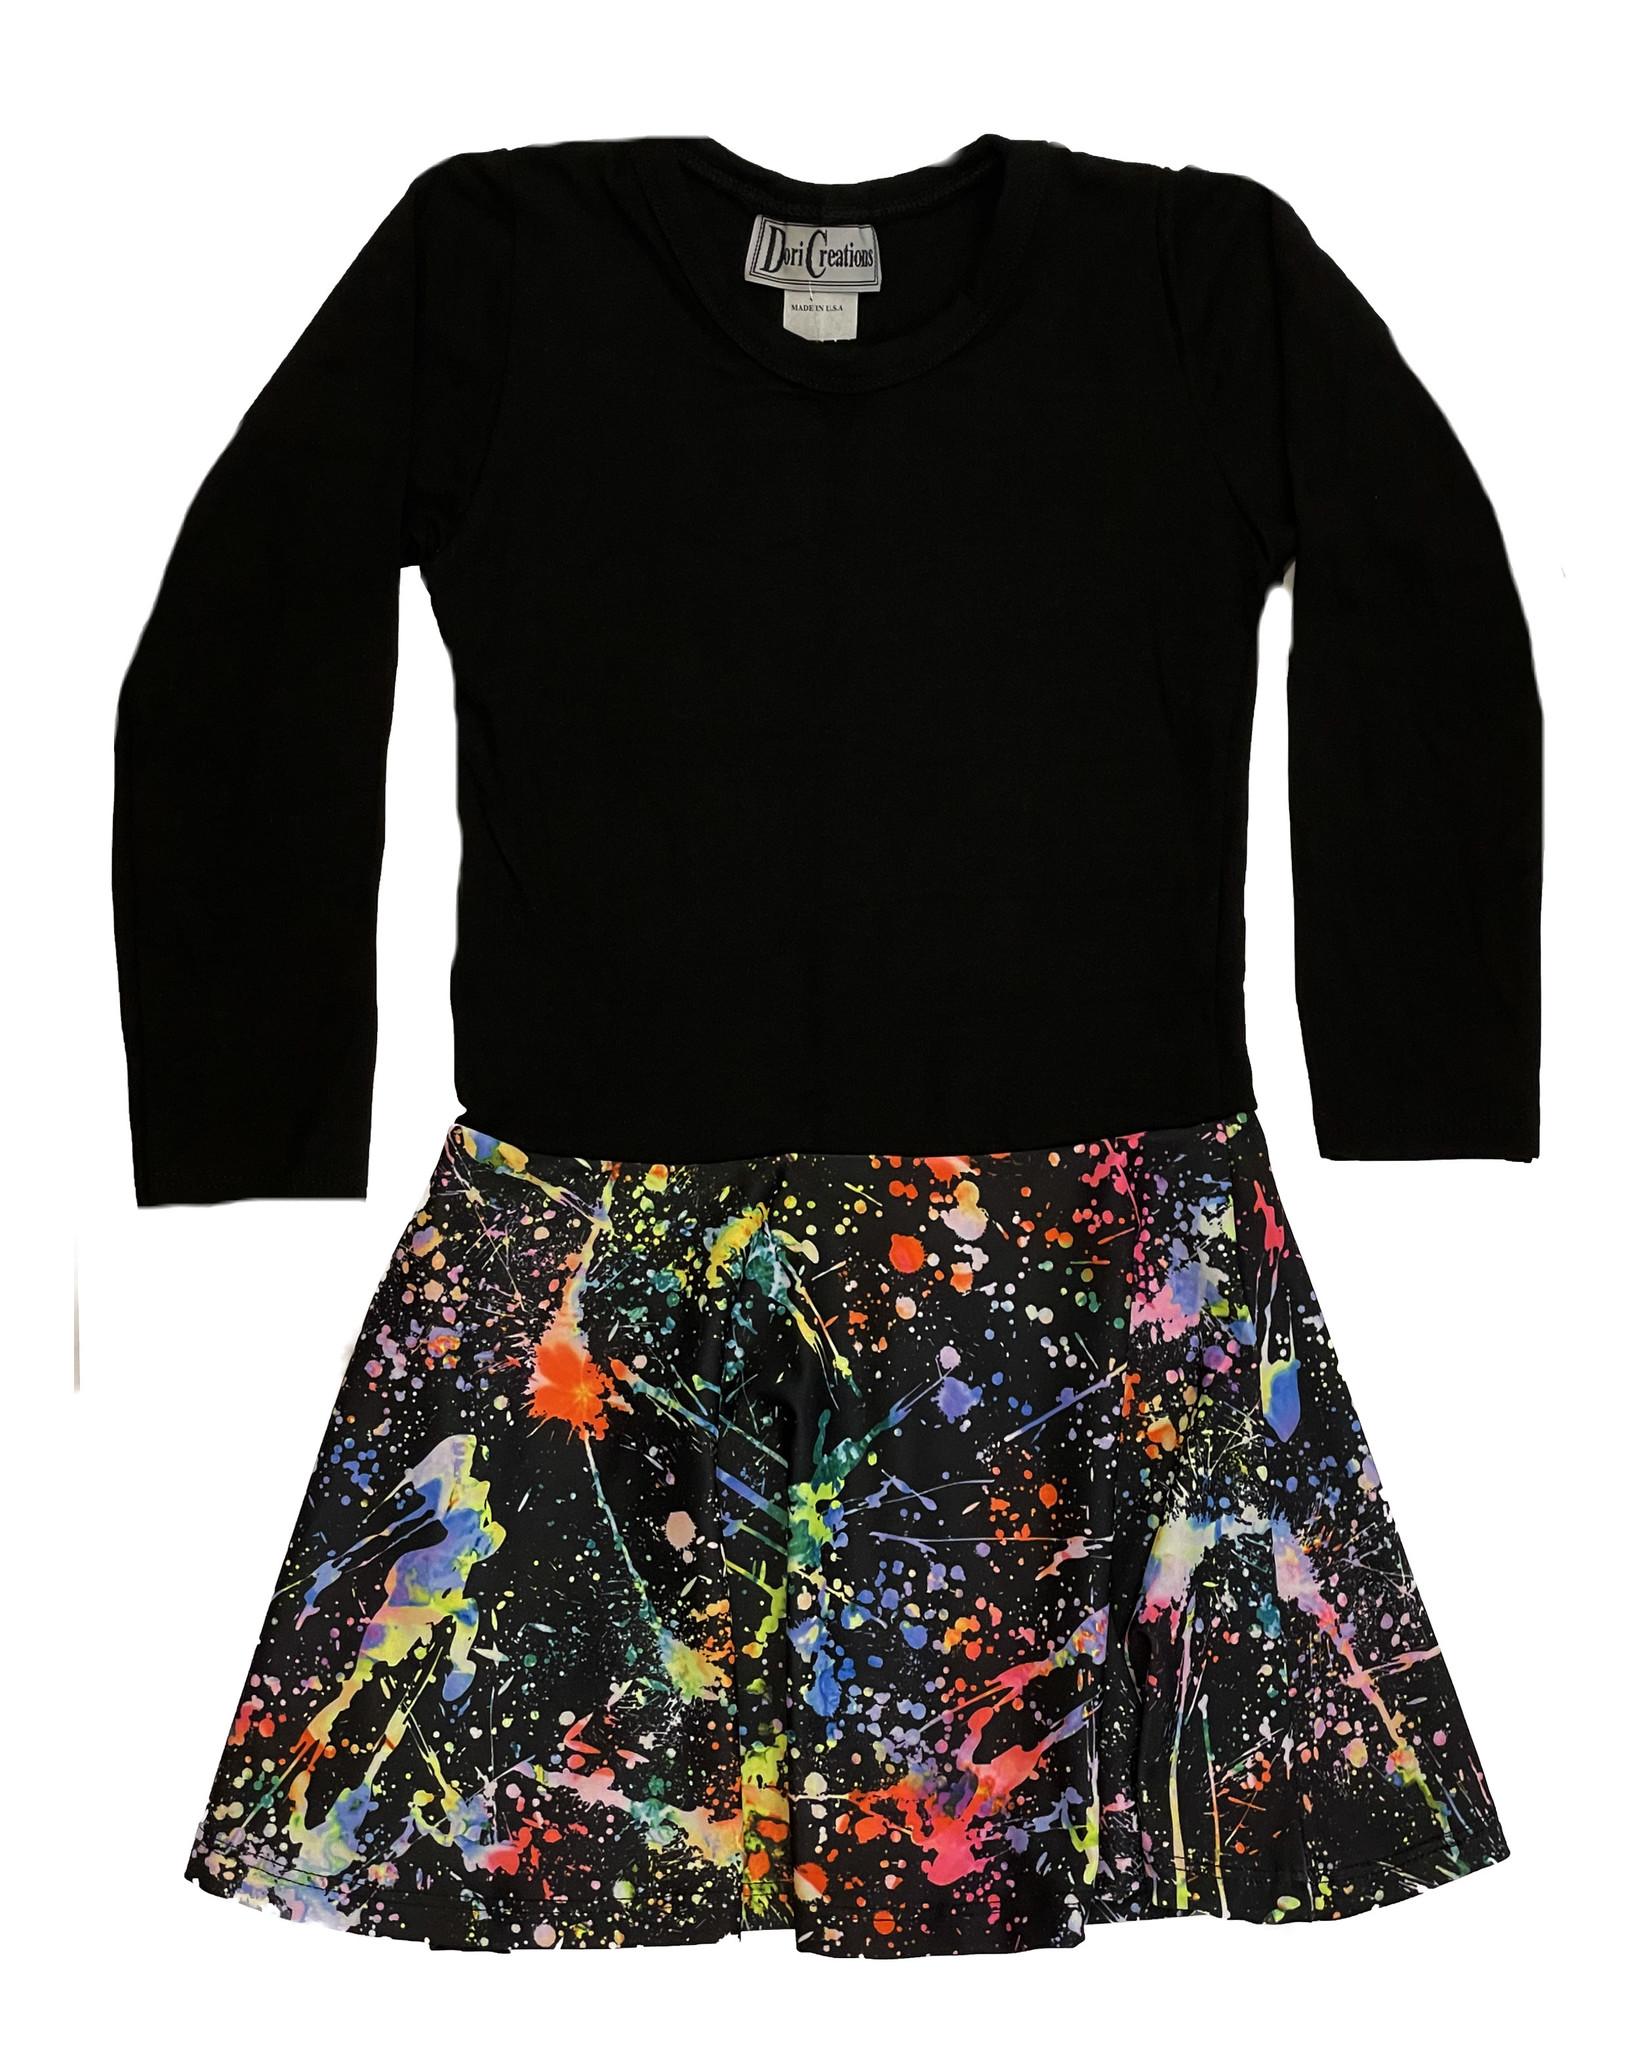 Dori Blk/Splatter Dress